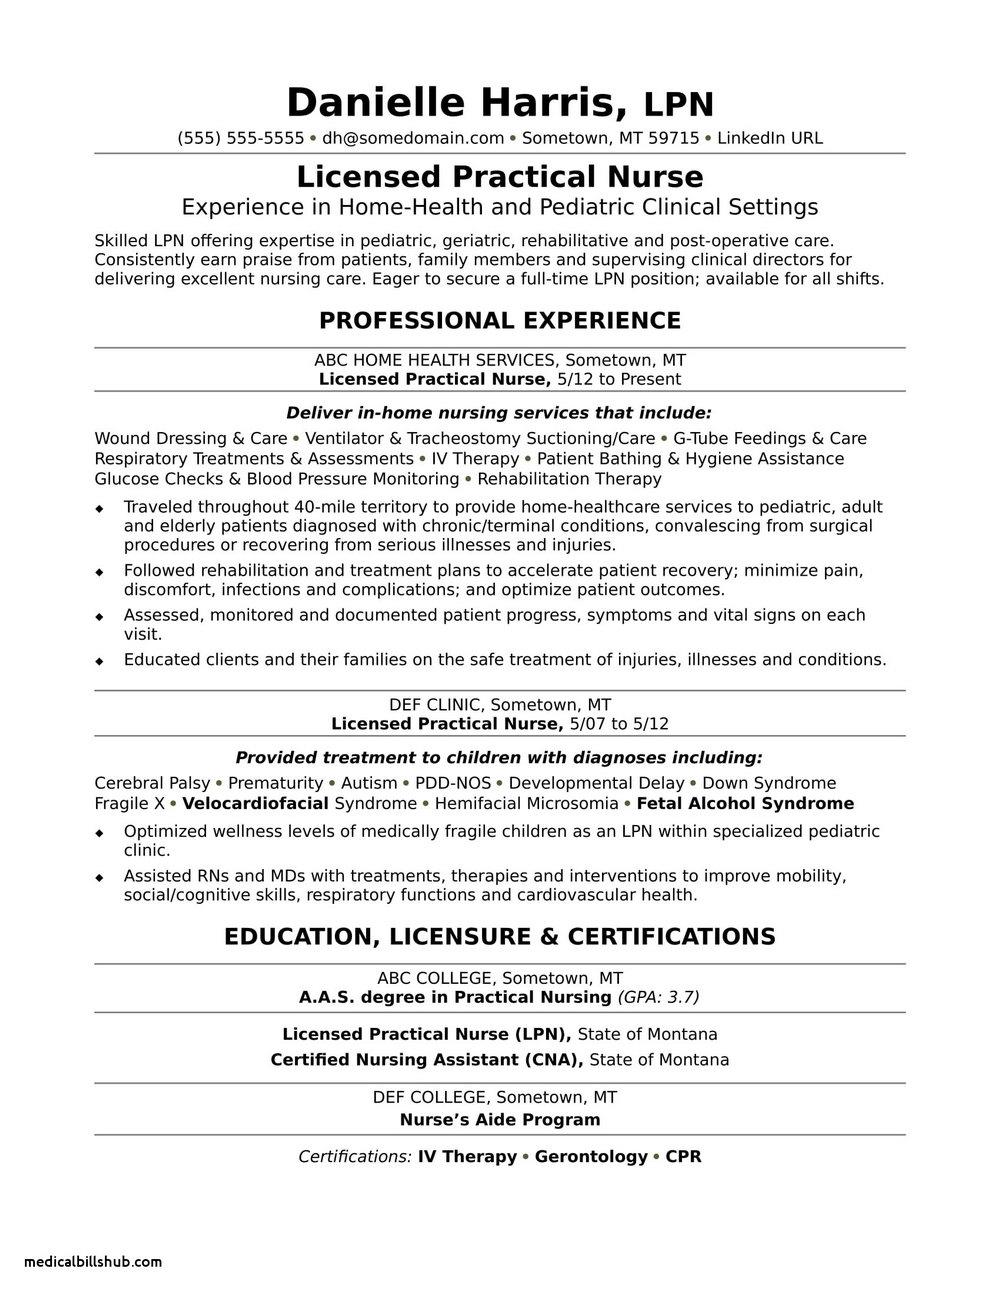 New Graduate Registered Nurse Resume Template